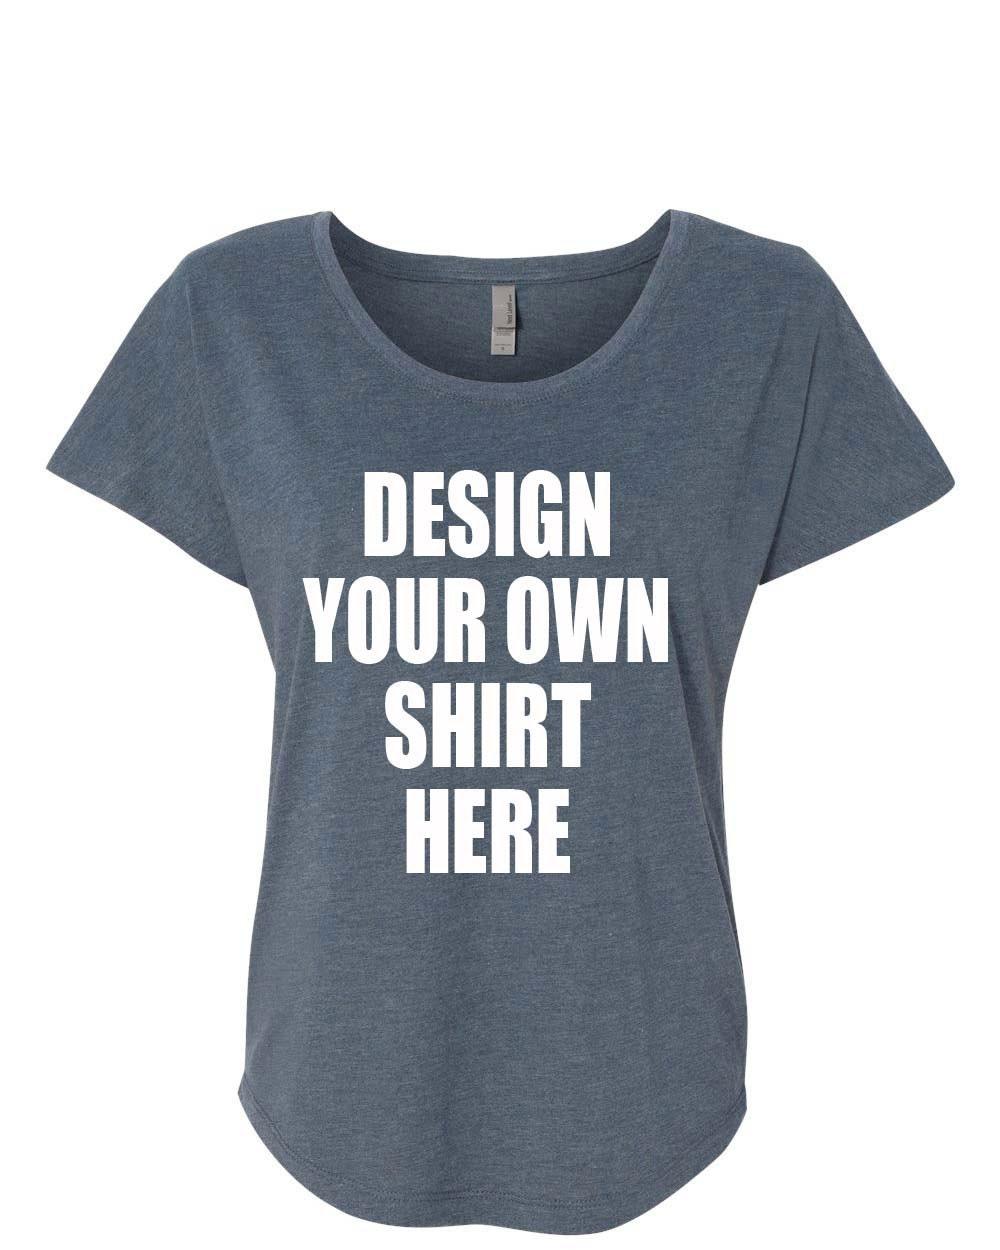 Shirt design your own - Custom Shirts Dolman Sleeve Off The Shoulder Shirt Design Your Own Shirt Personalized Shirts Disney Shirts Bachelorette Party Shirts